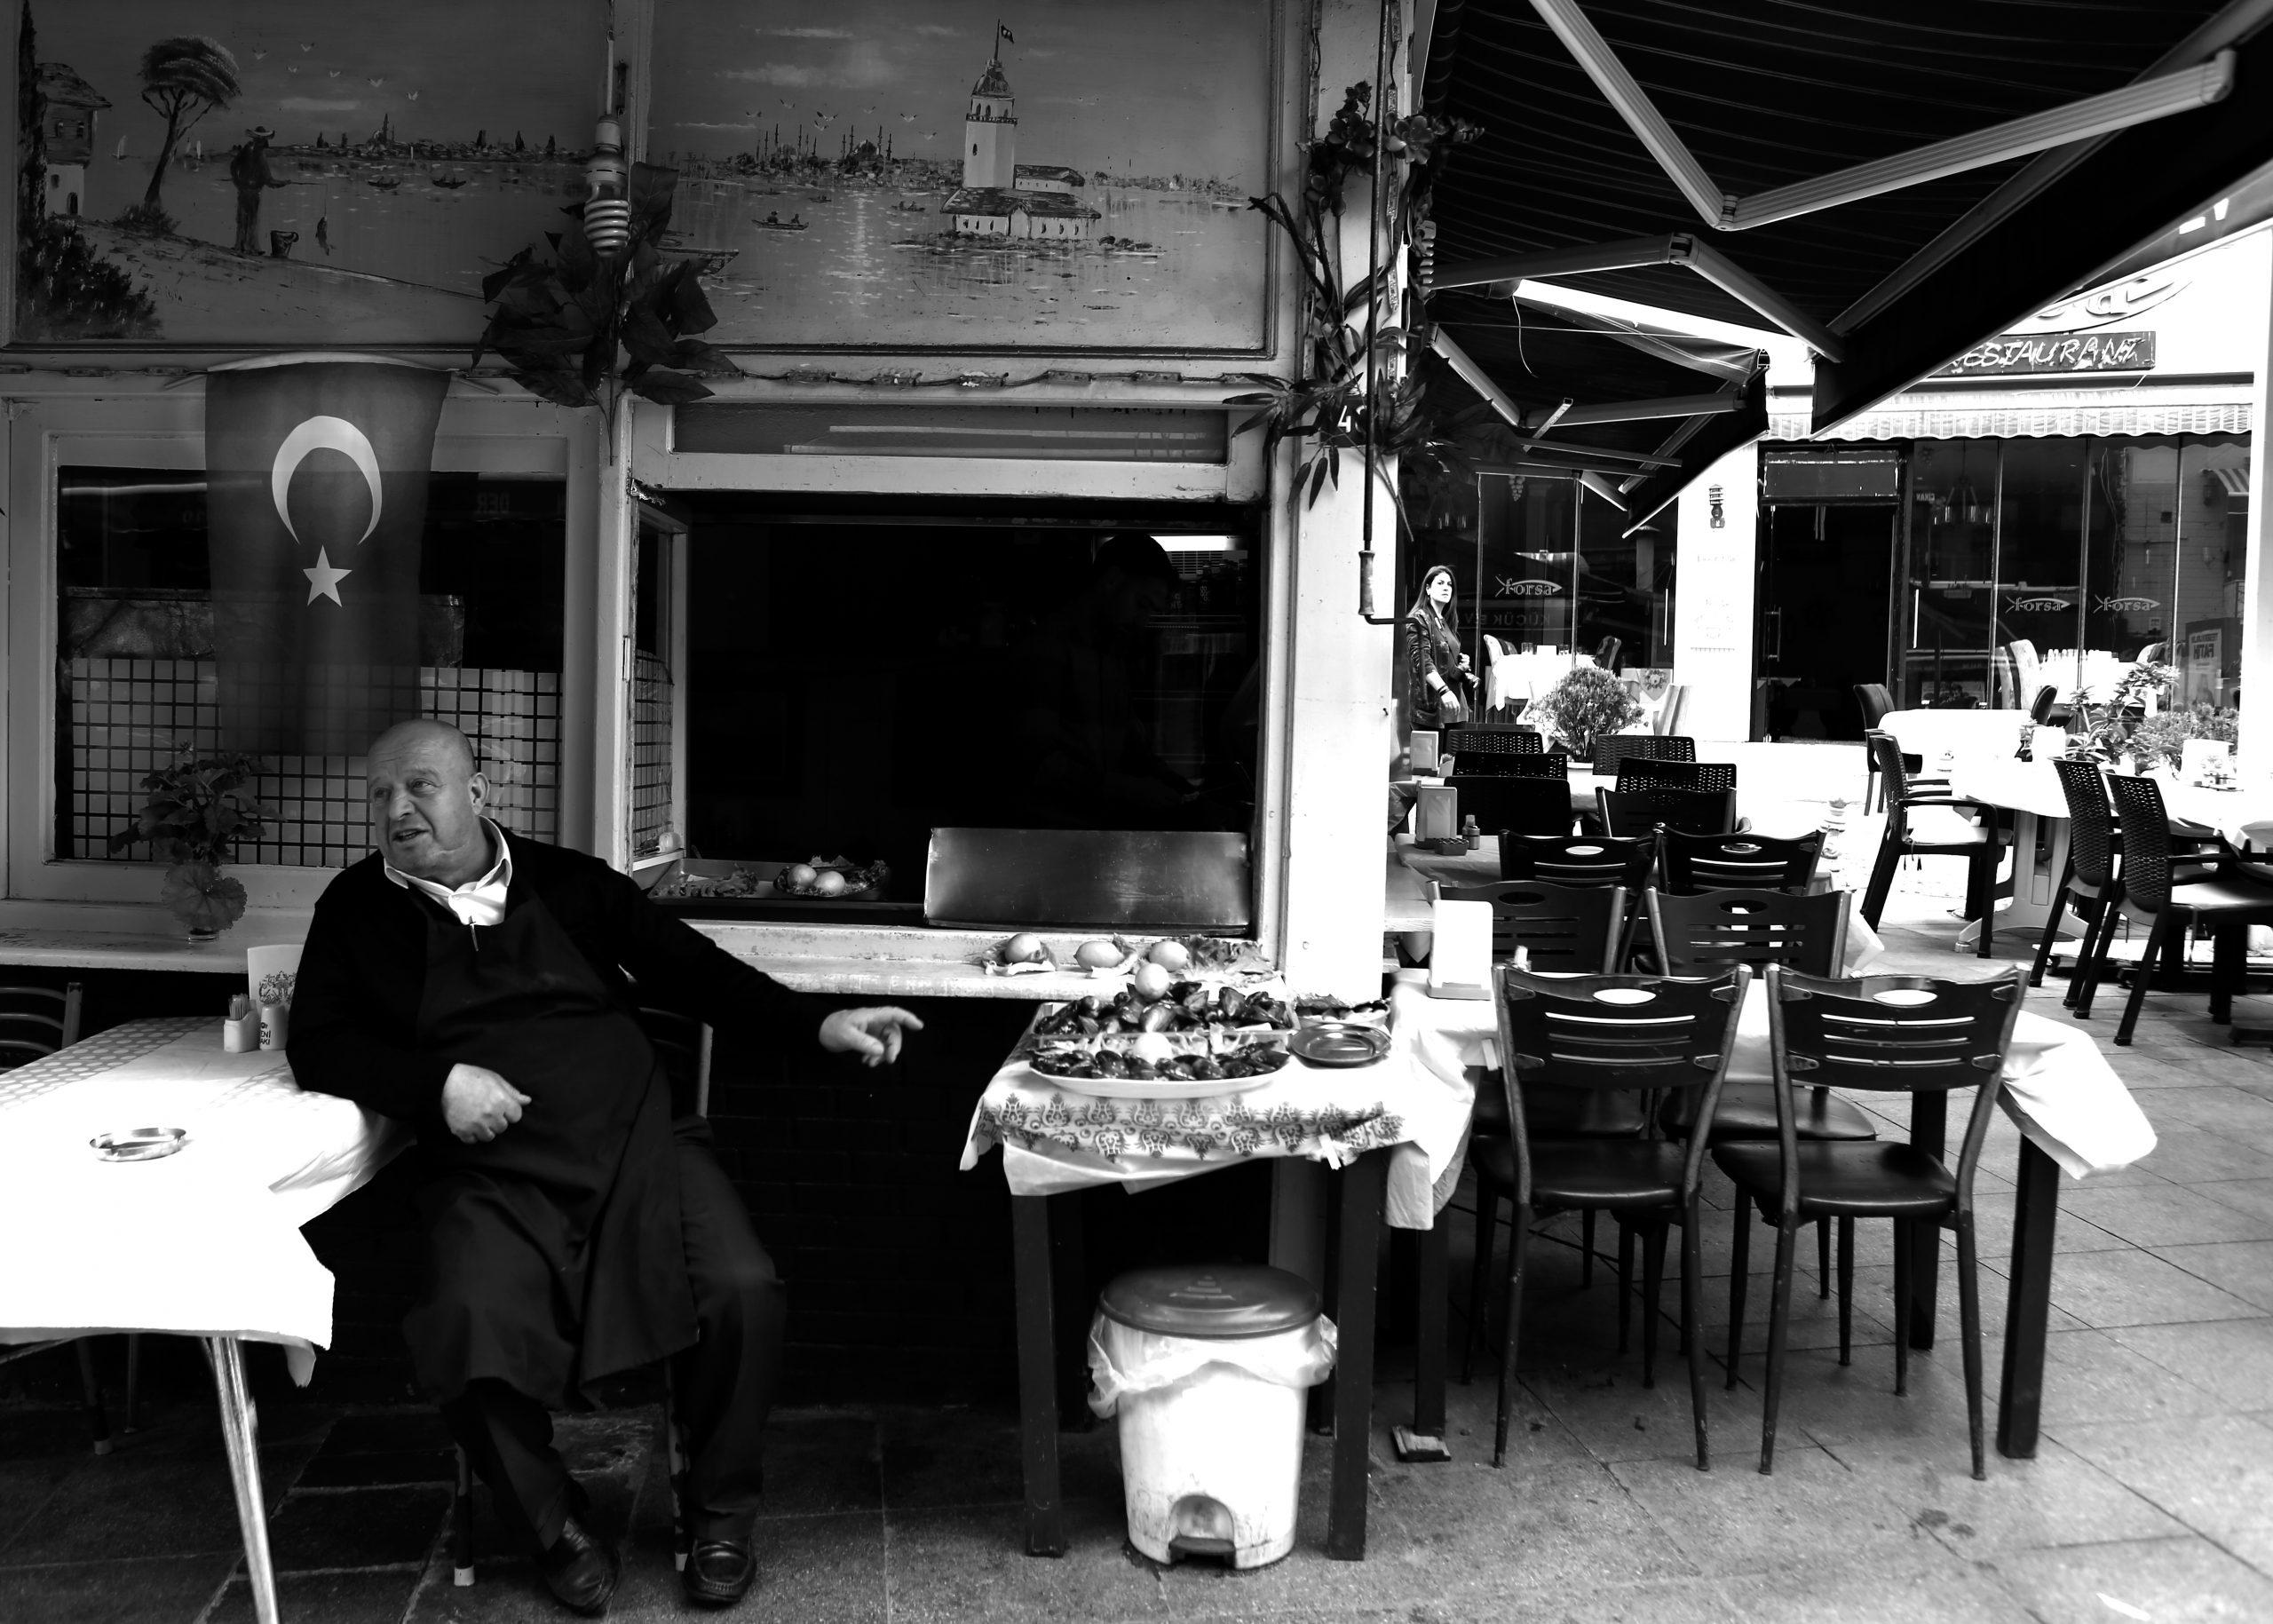 Mussel seller in Istanbul